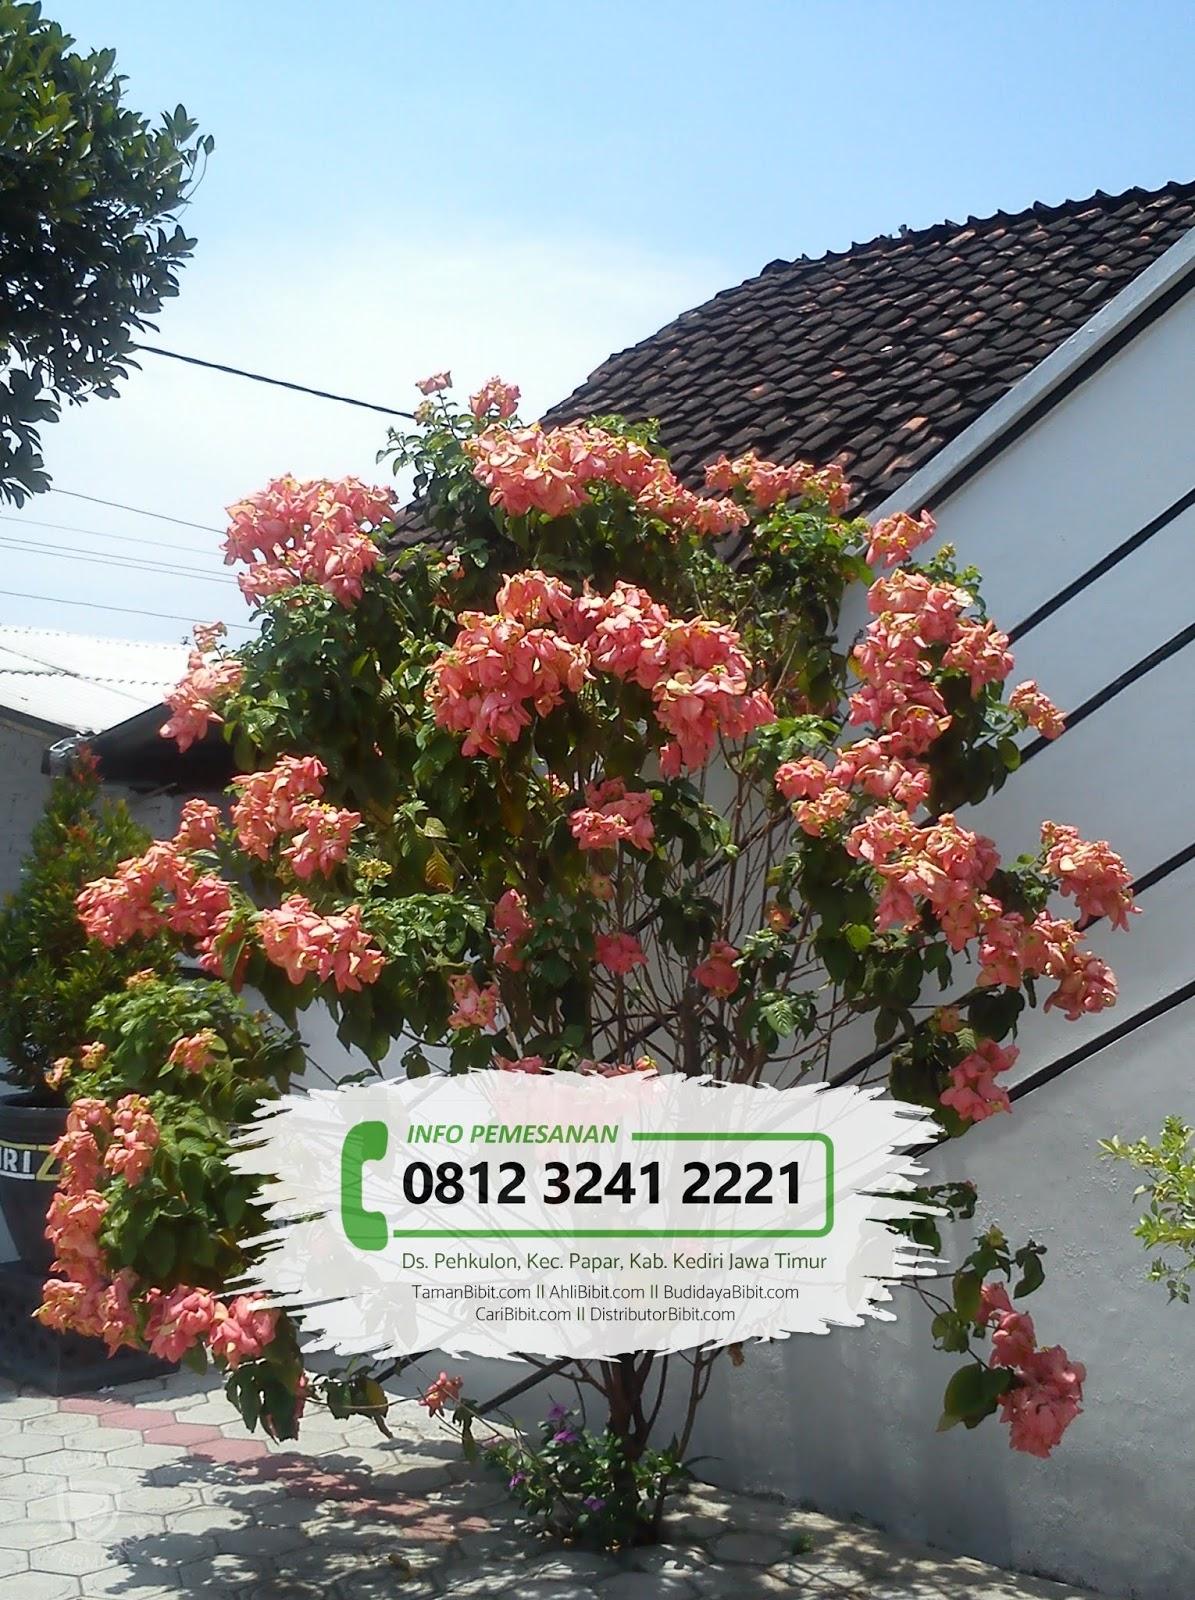 Jual Bibit Bunga Nusa Indah Tamanbibit Com